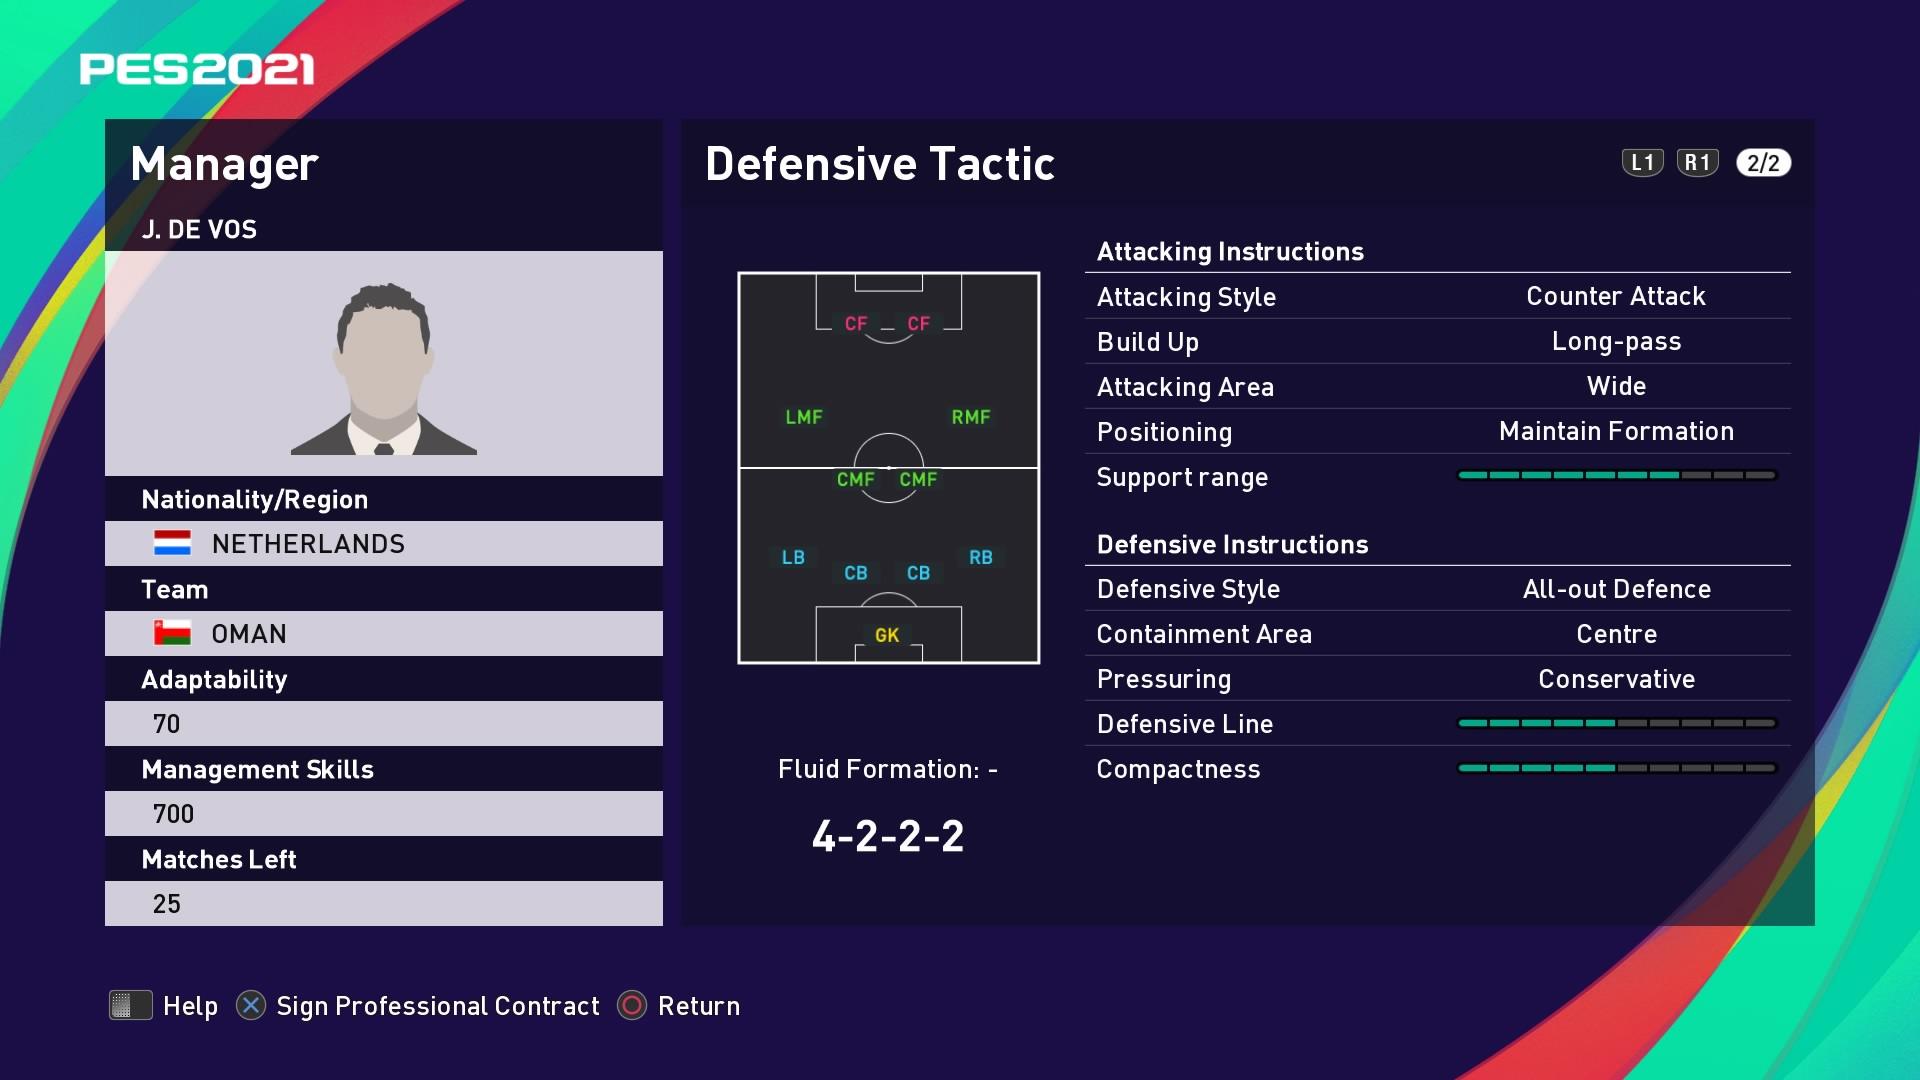 J. De Vos (Erwin Koeman) Defensive Tactic in PES 2021 myClub